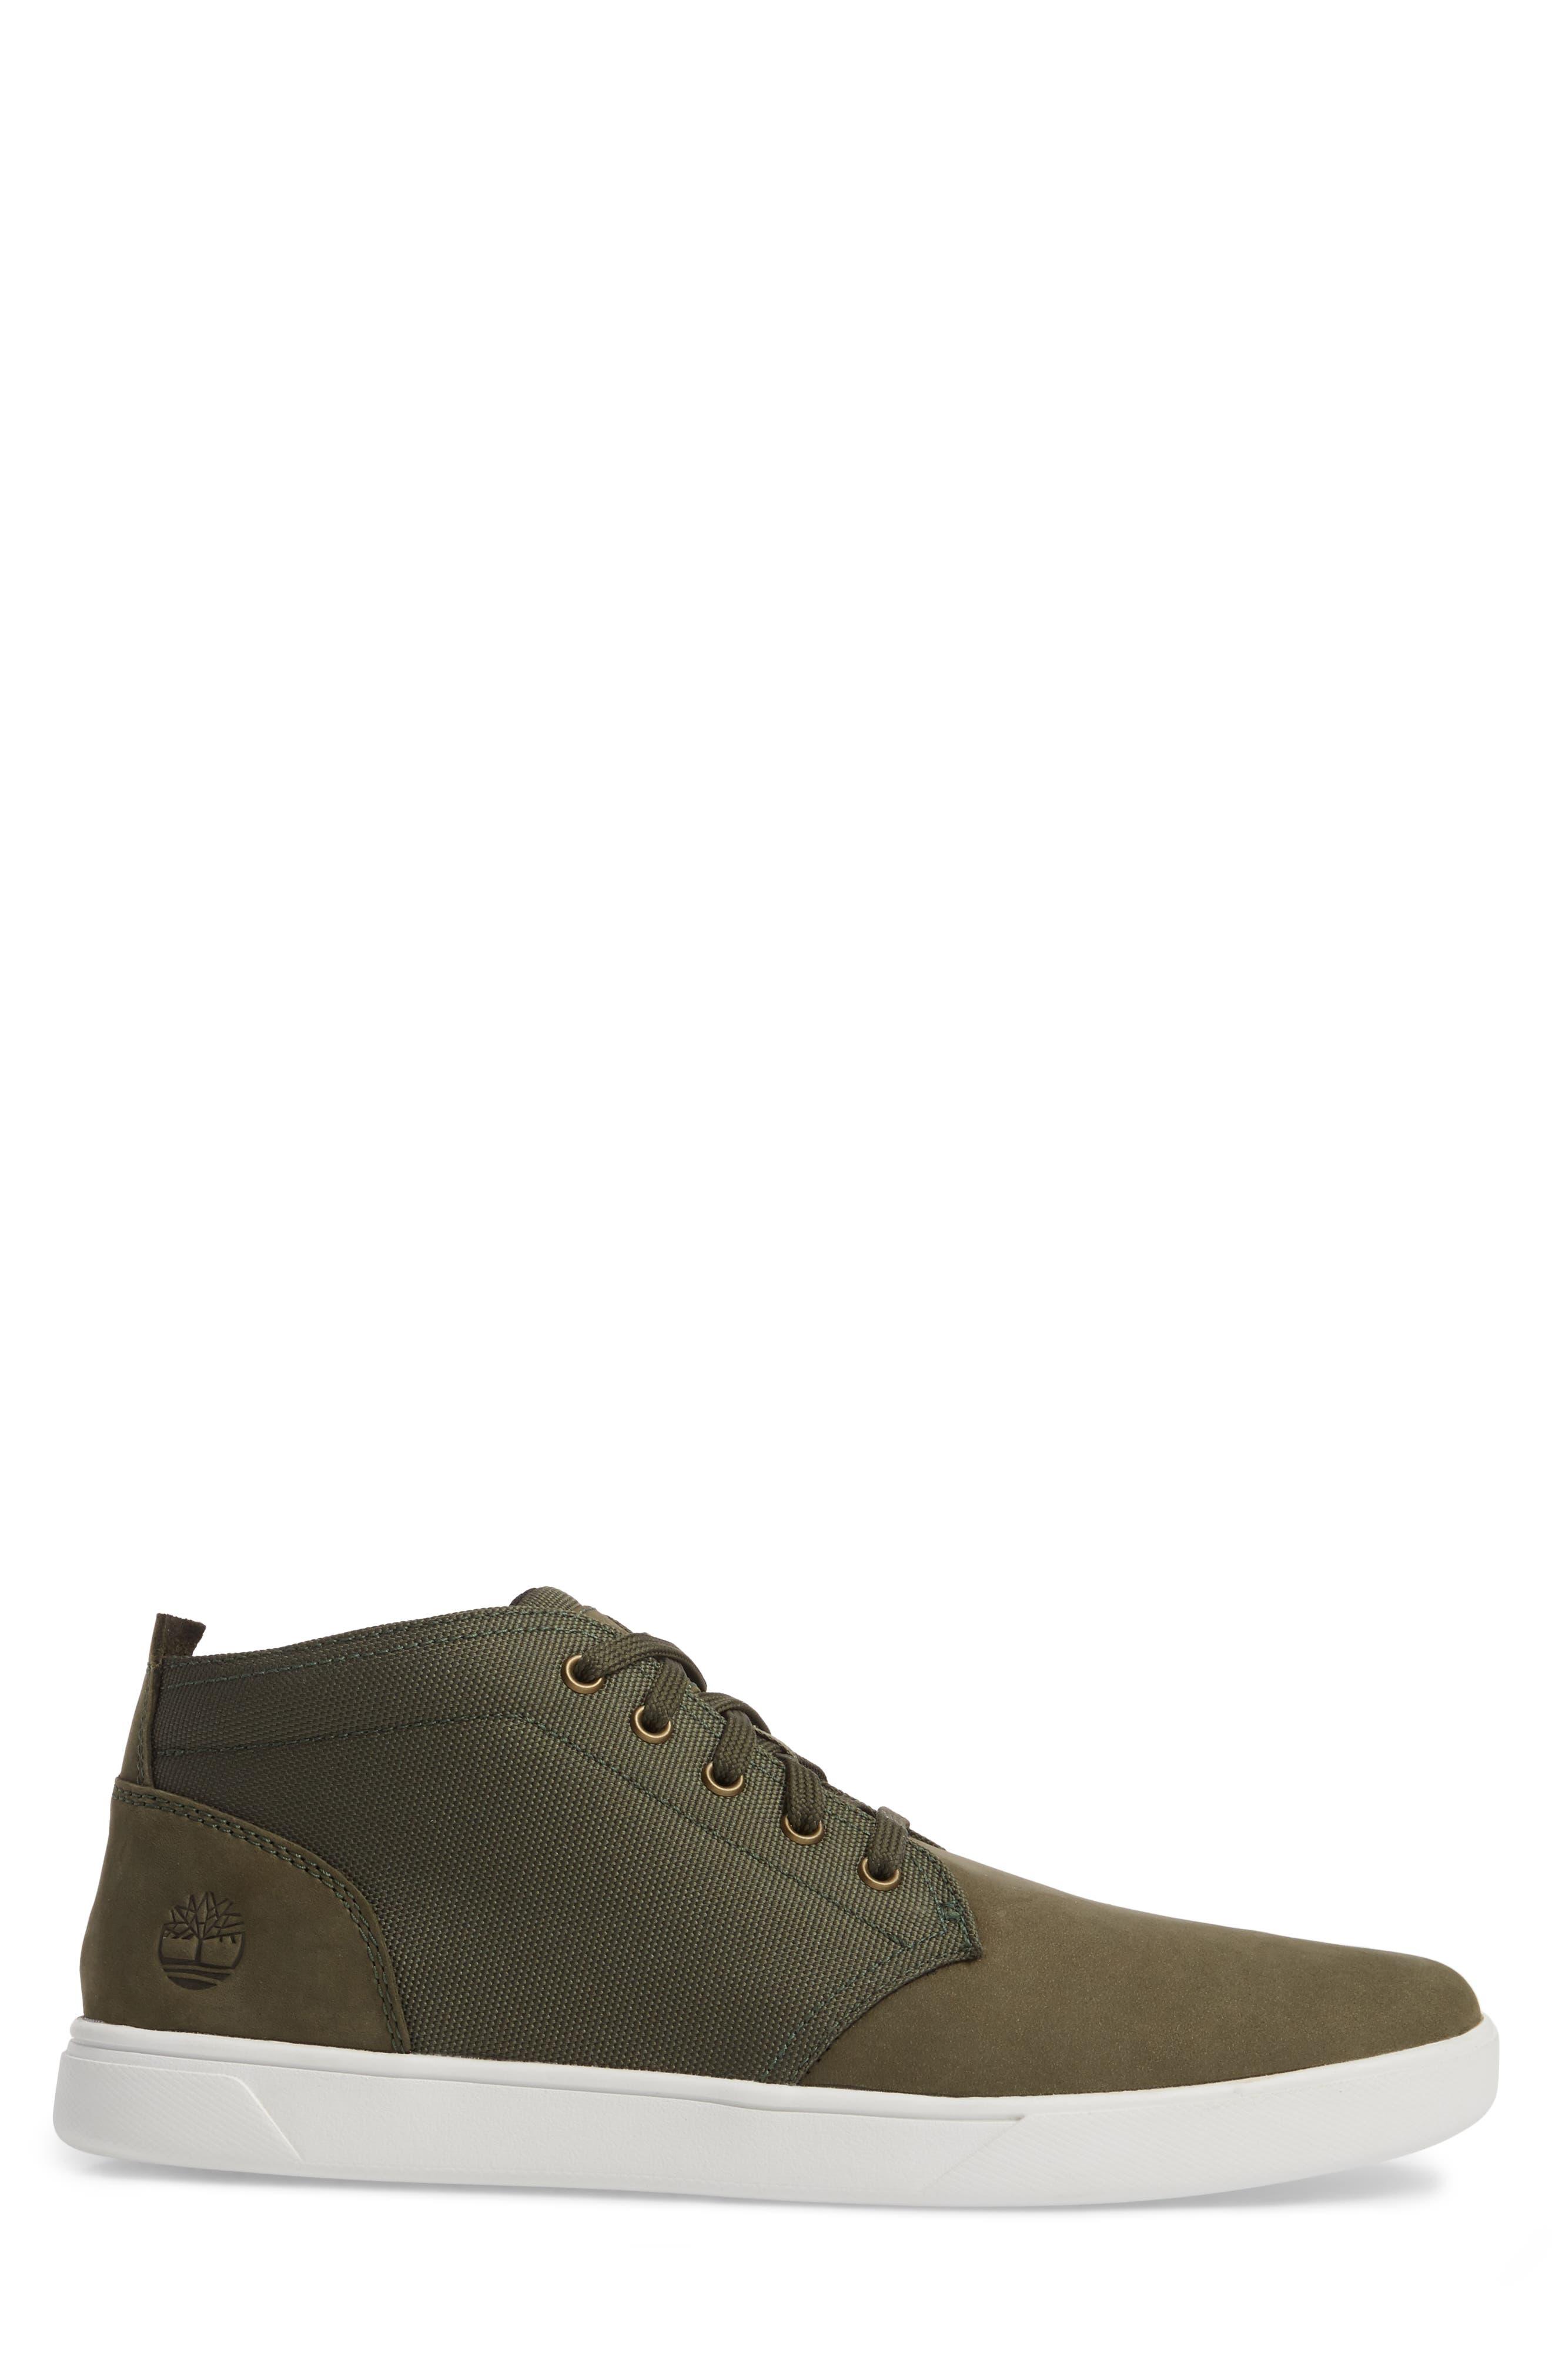 Earthkeepers<sup>®</sup> 'Groveton' Chukka Sneaker,                             Alternate thumbnail 3, color,                             Grape Leaf Leather